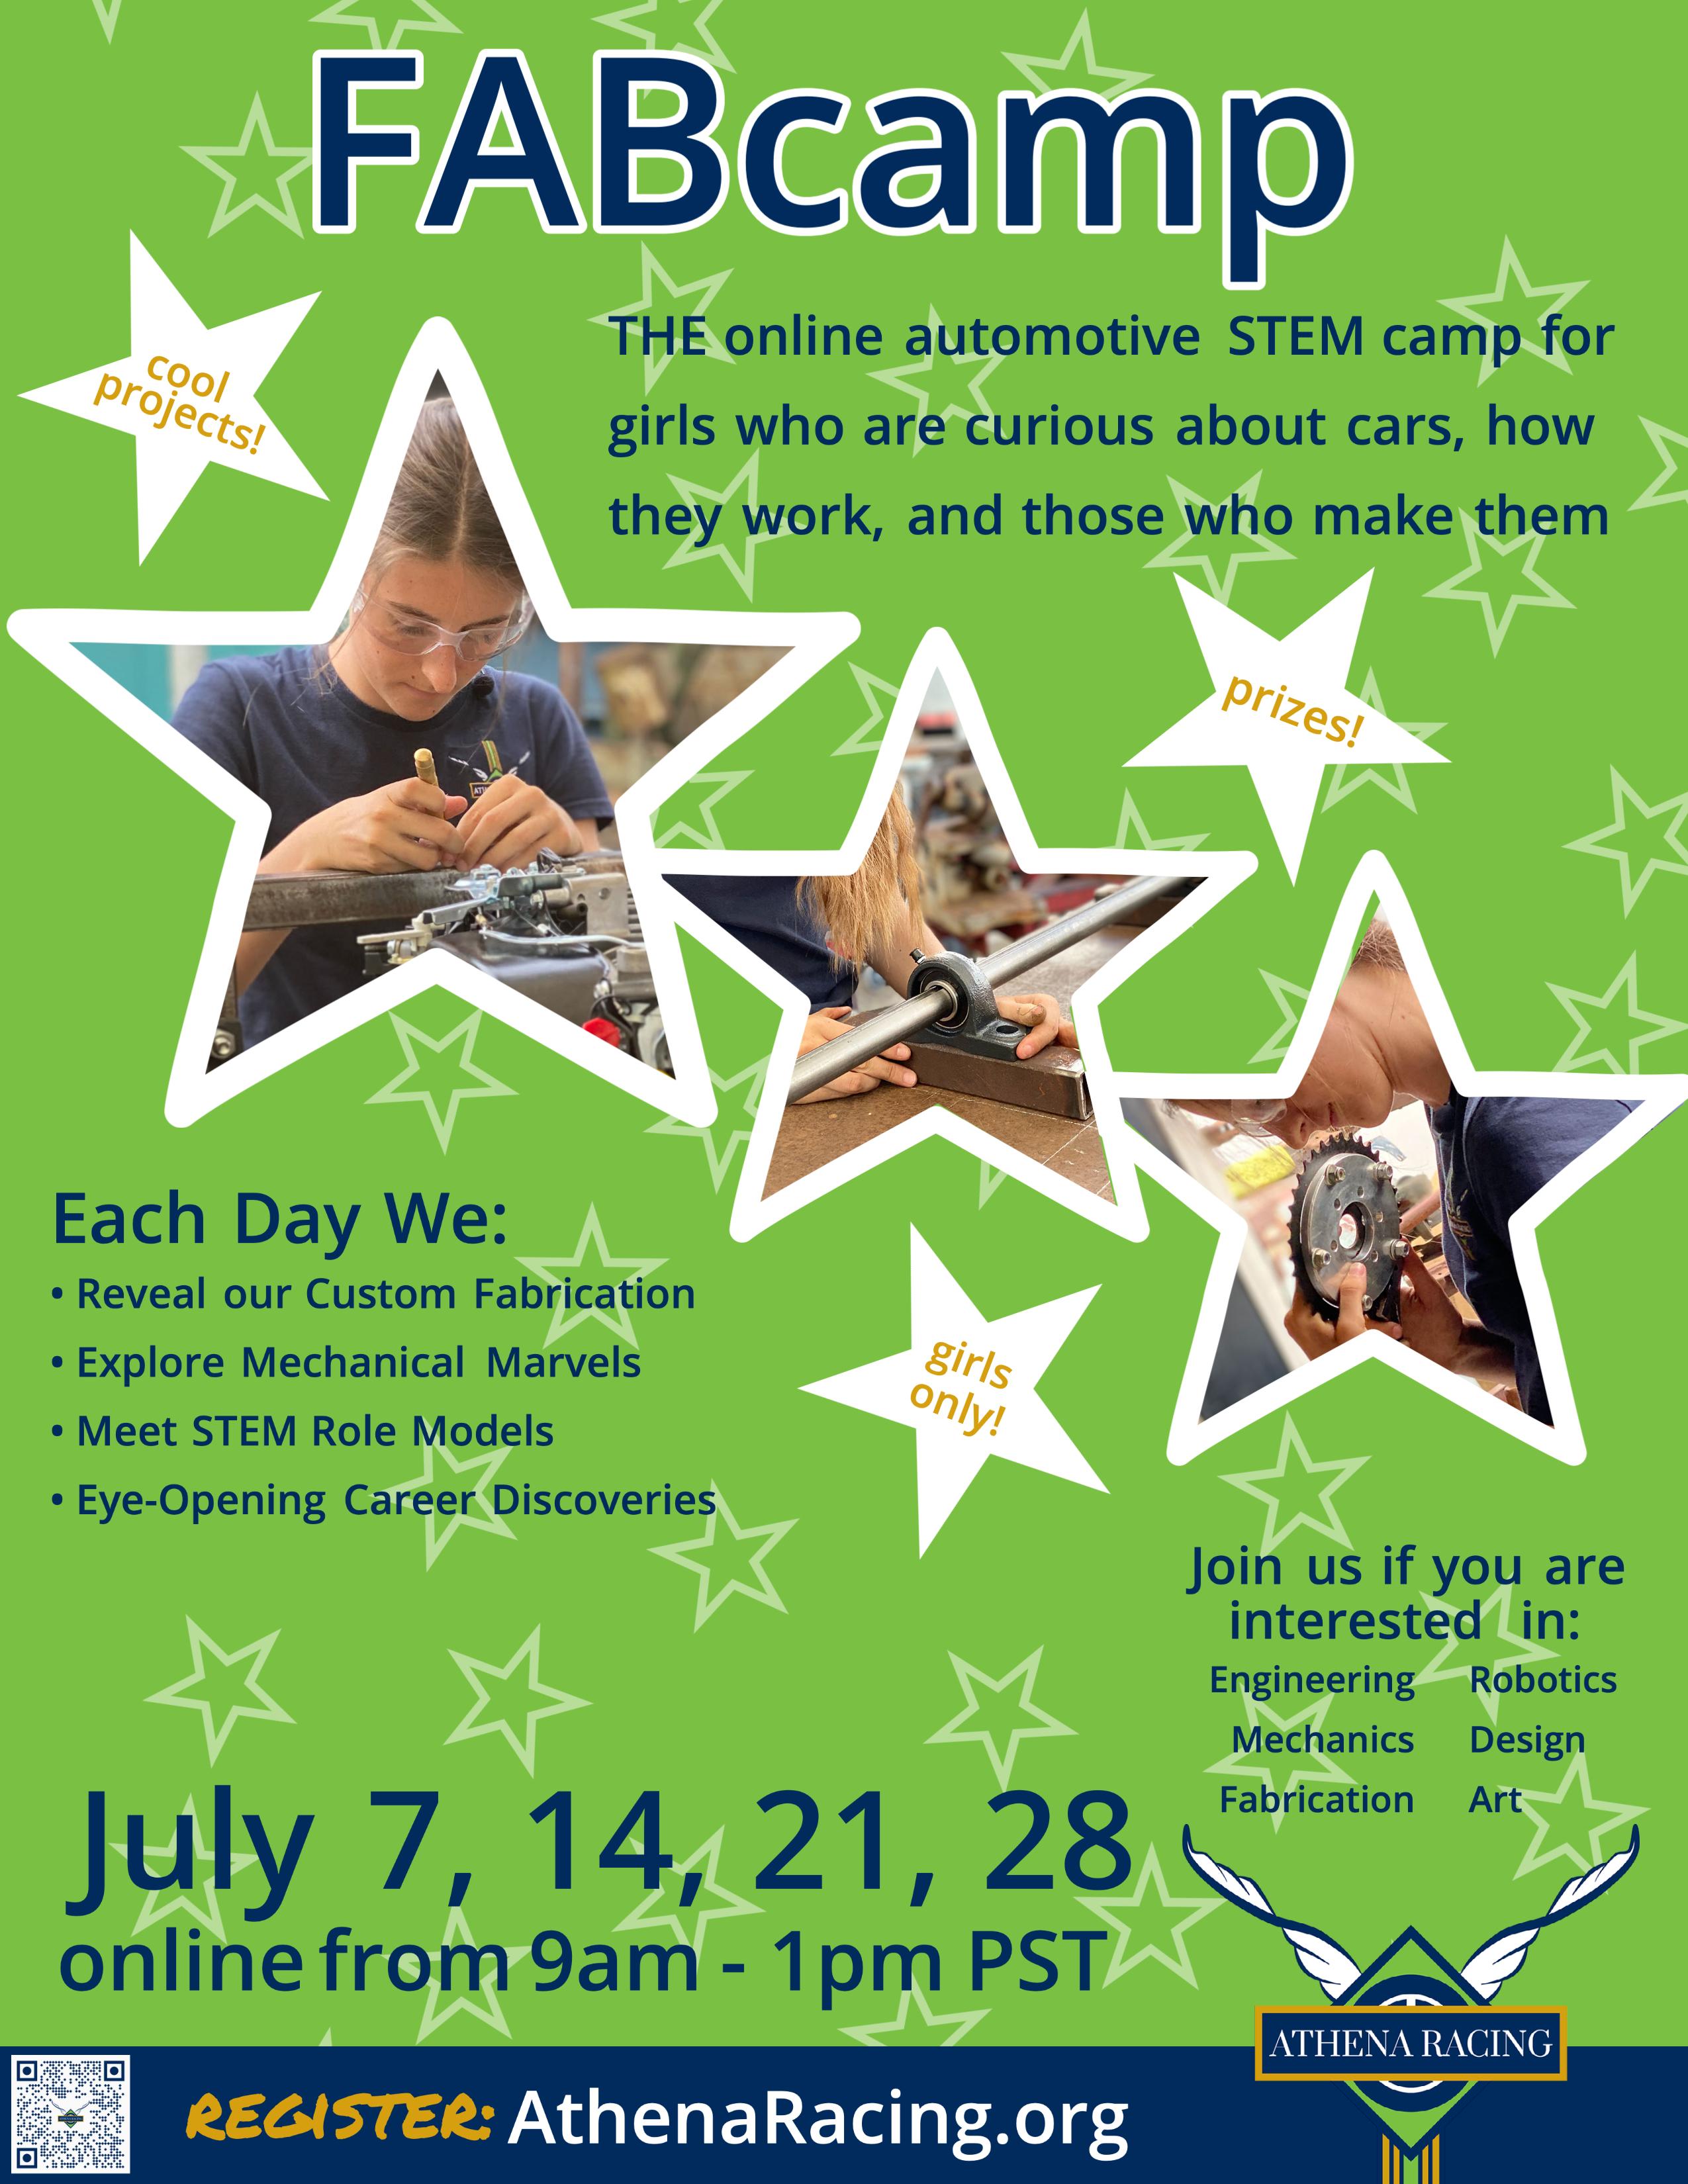 Summer Program -    FABcamp: Explore Design, Engineering, Fabrication & Entrepreneurship